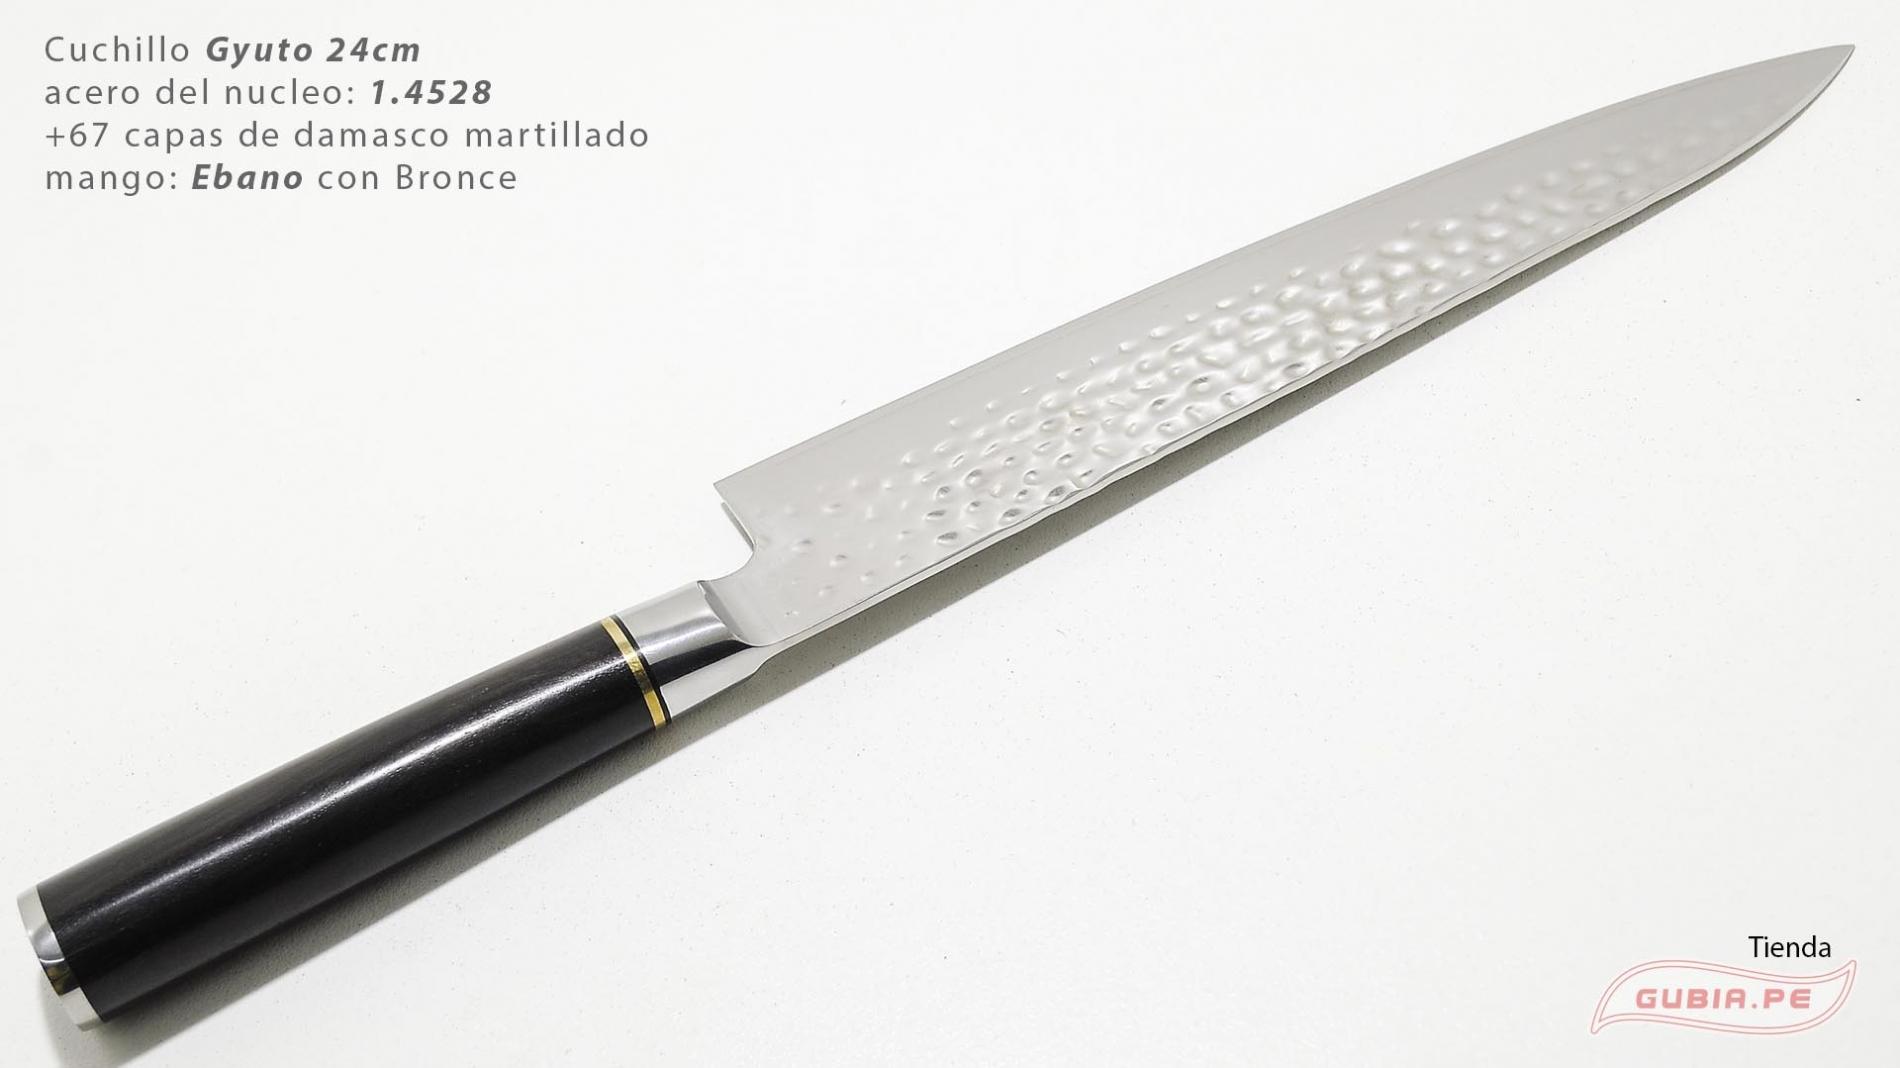 B1zEg24-Cuchillo Gyuto 24cm acero 1.4528+damasco Ebano+Bronce B1zEg24-max-3.